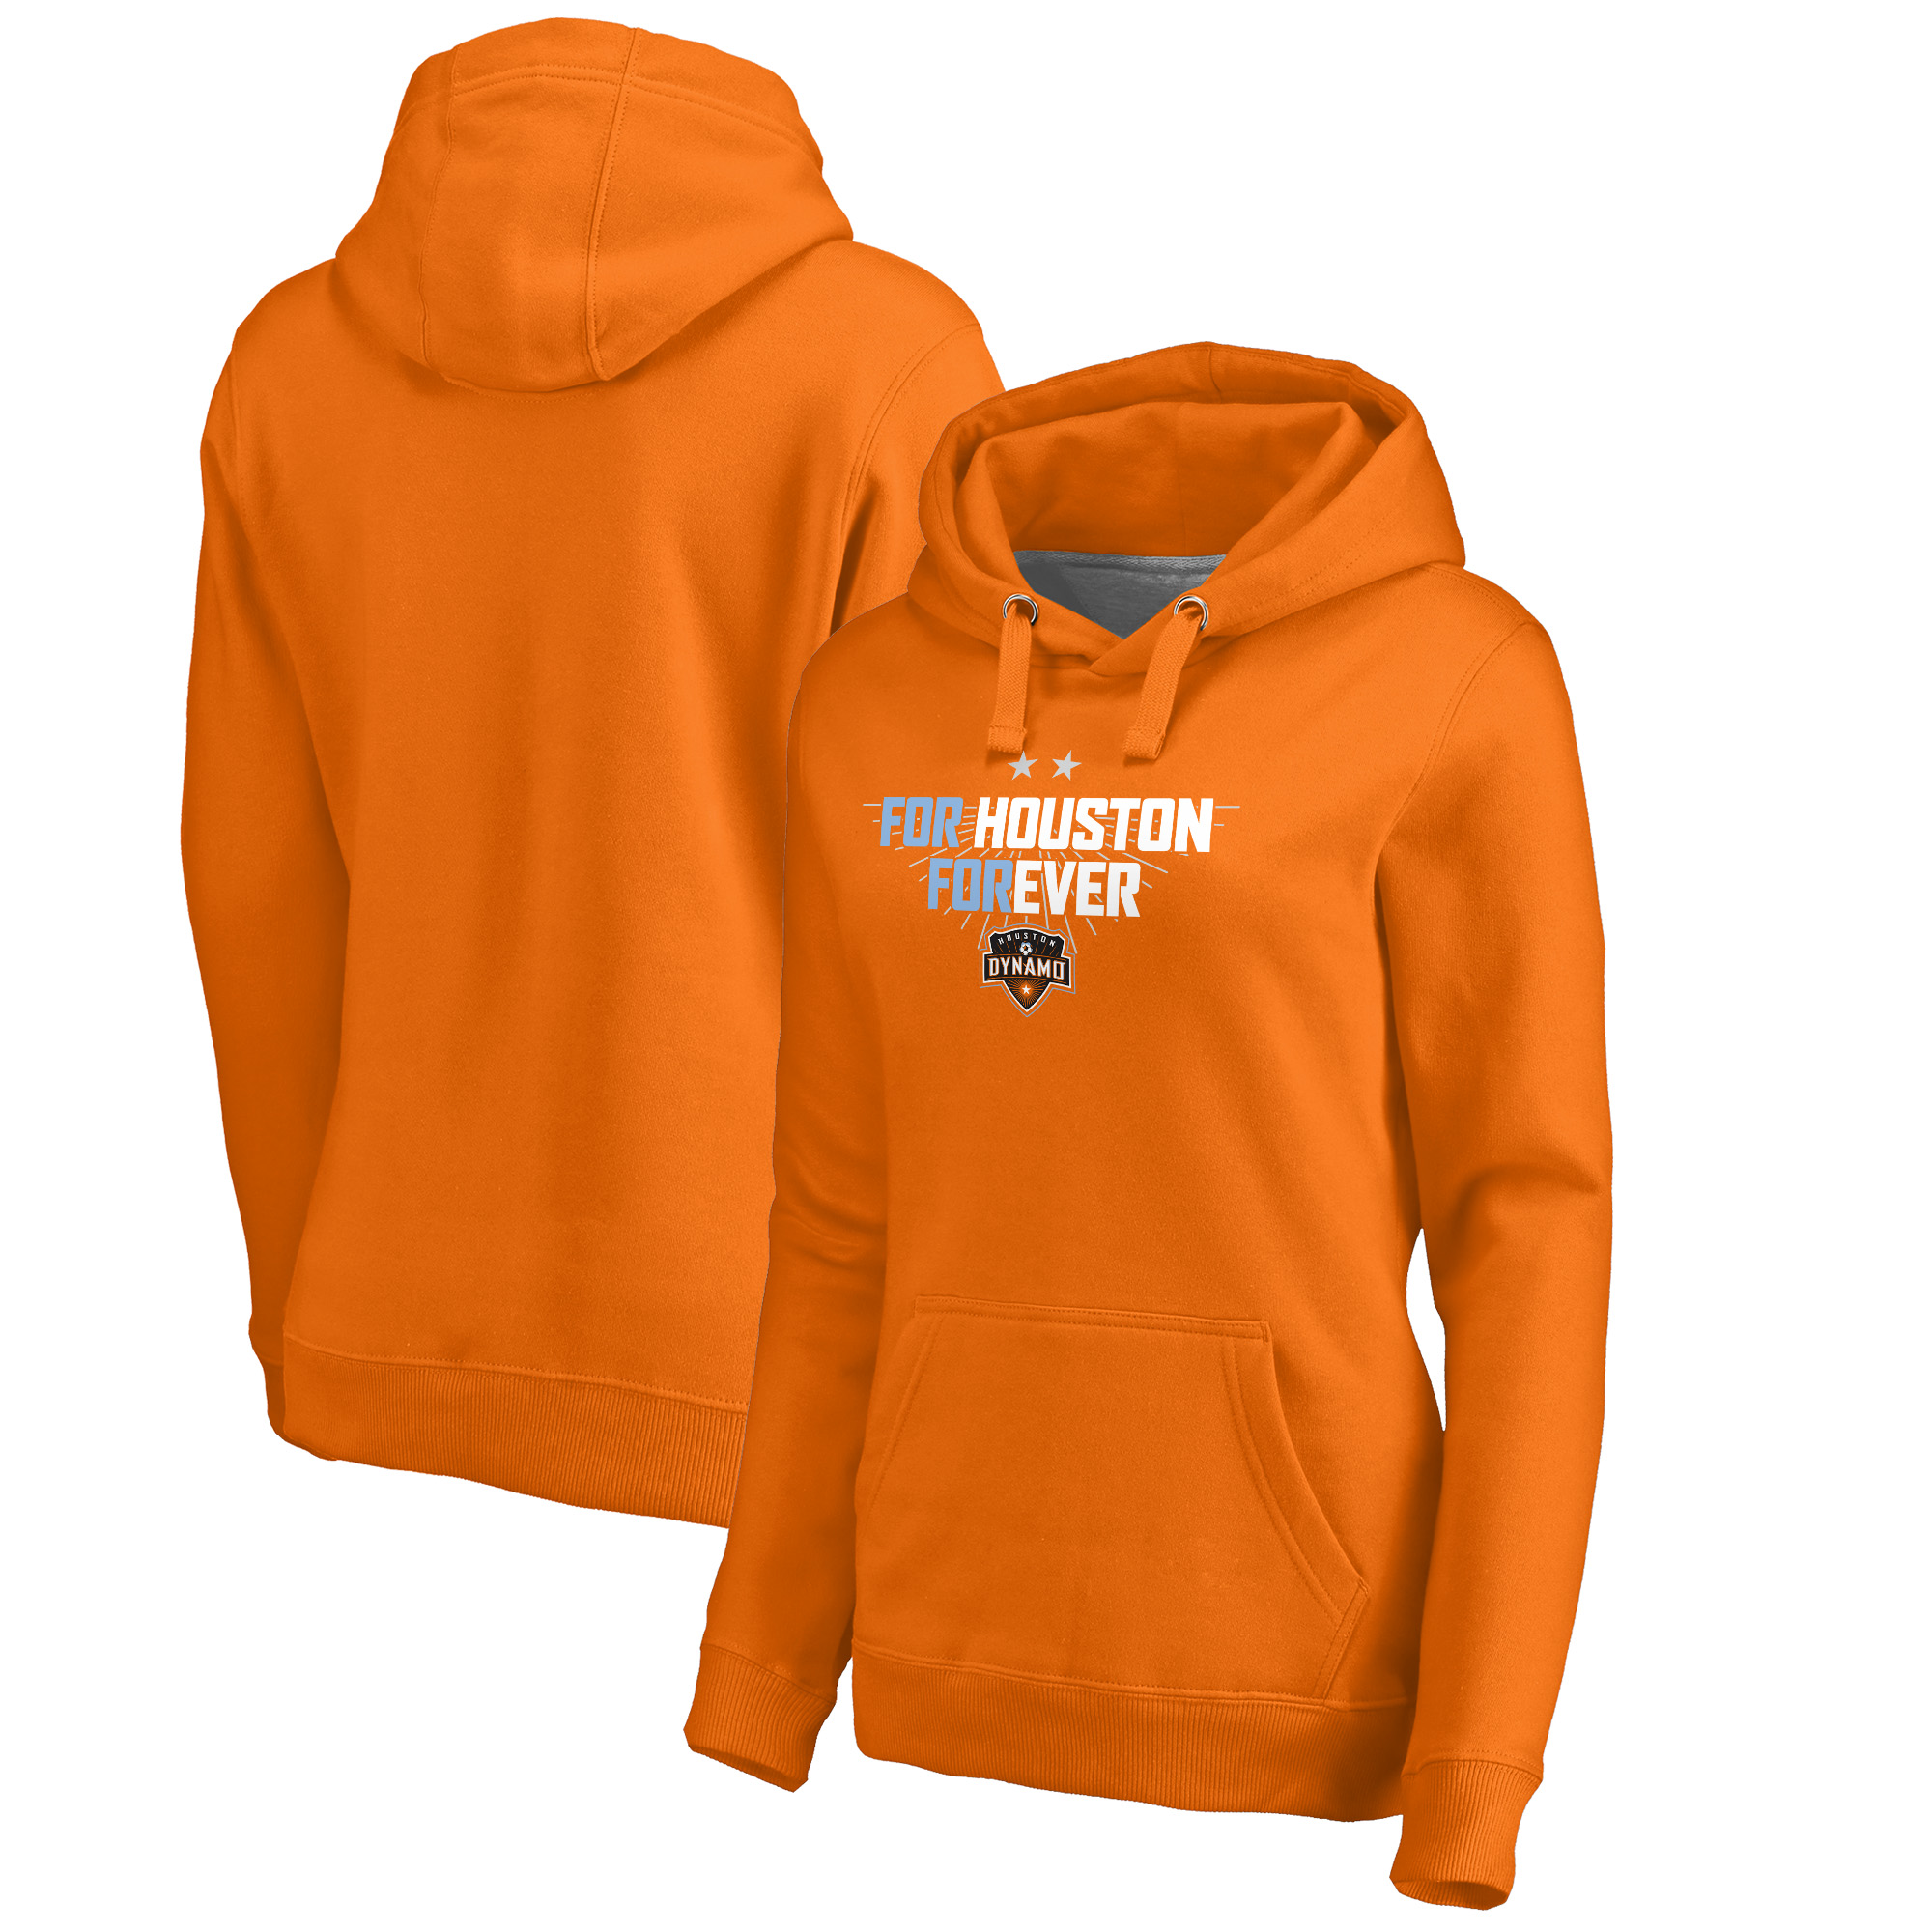 Houston Dynamo Fanatics Branded Women's For Houston Pullover Hoodie - Tenn Orange